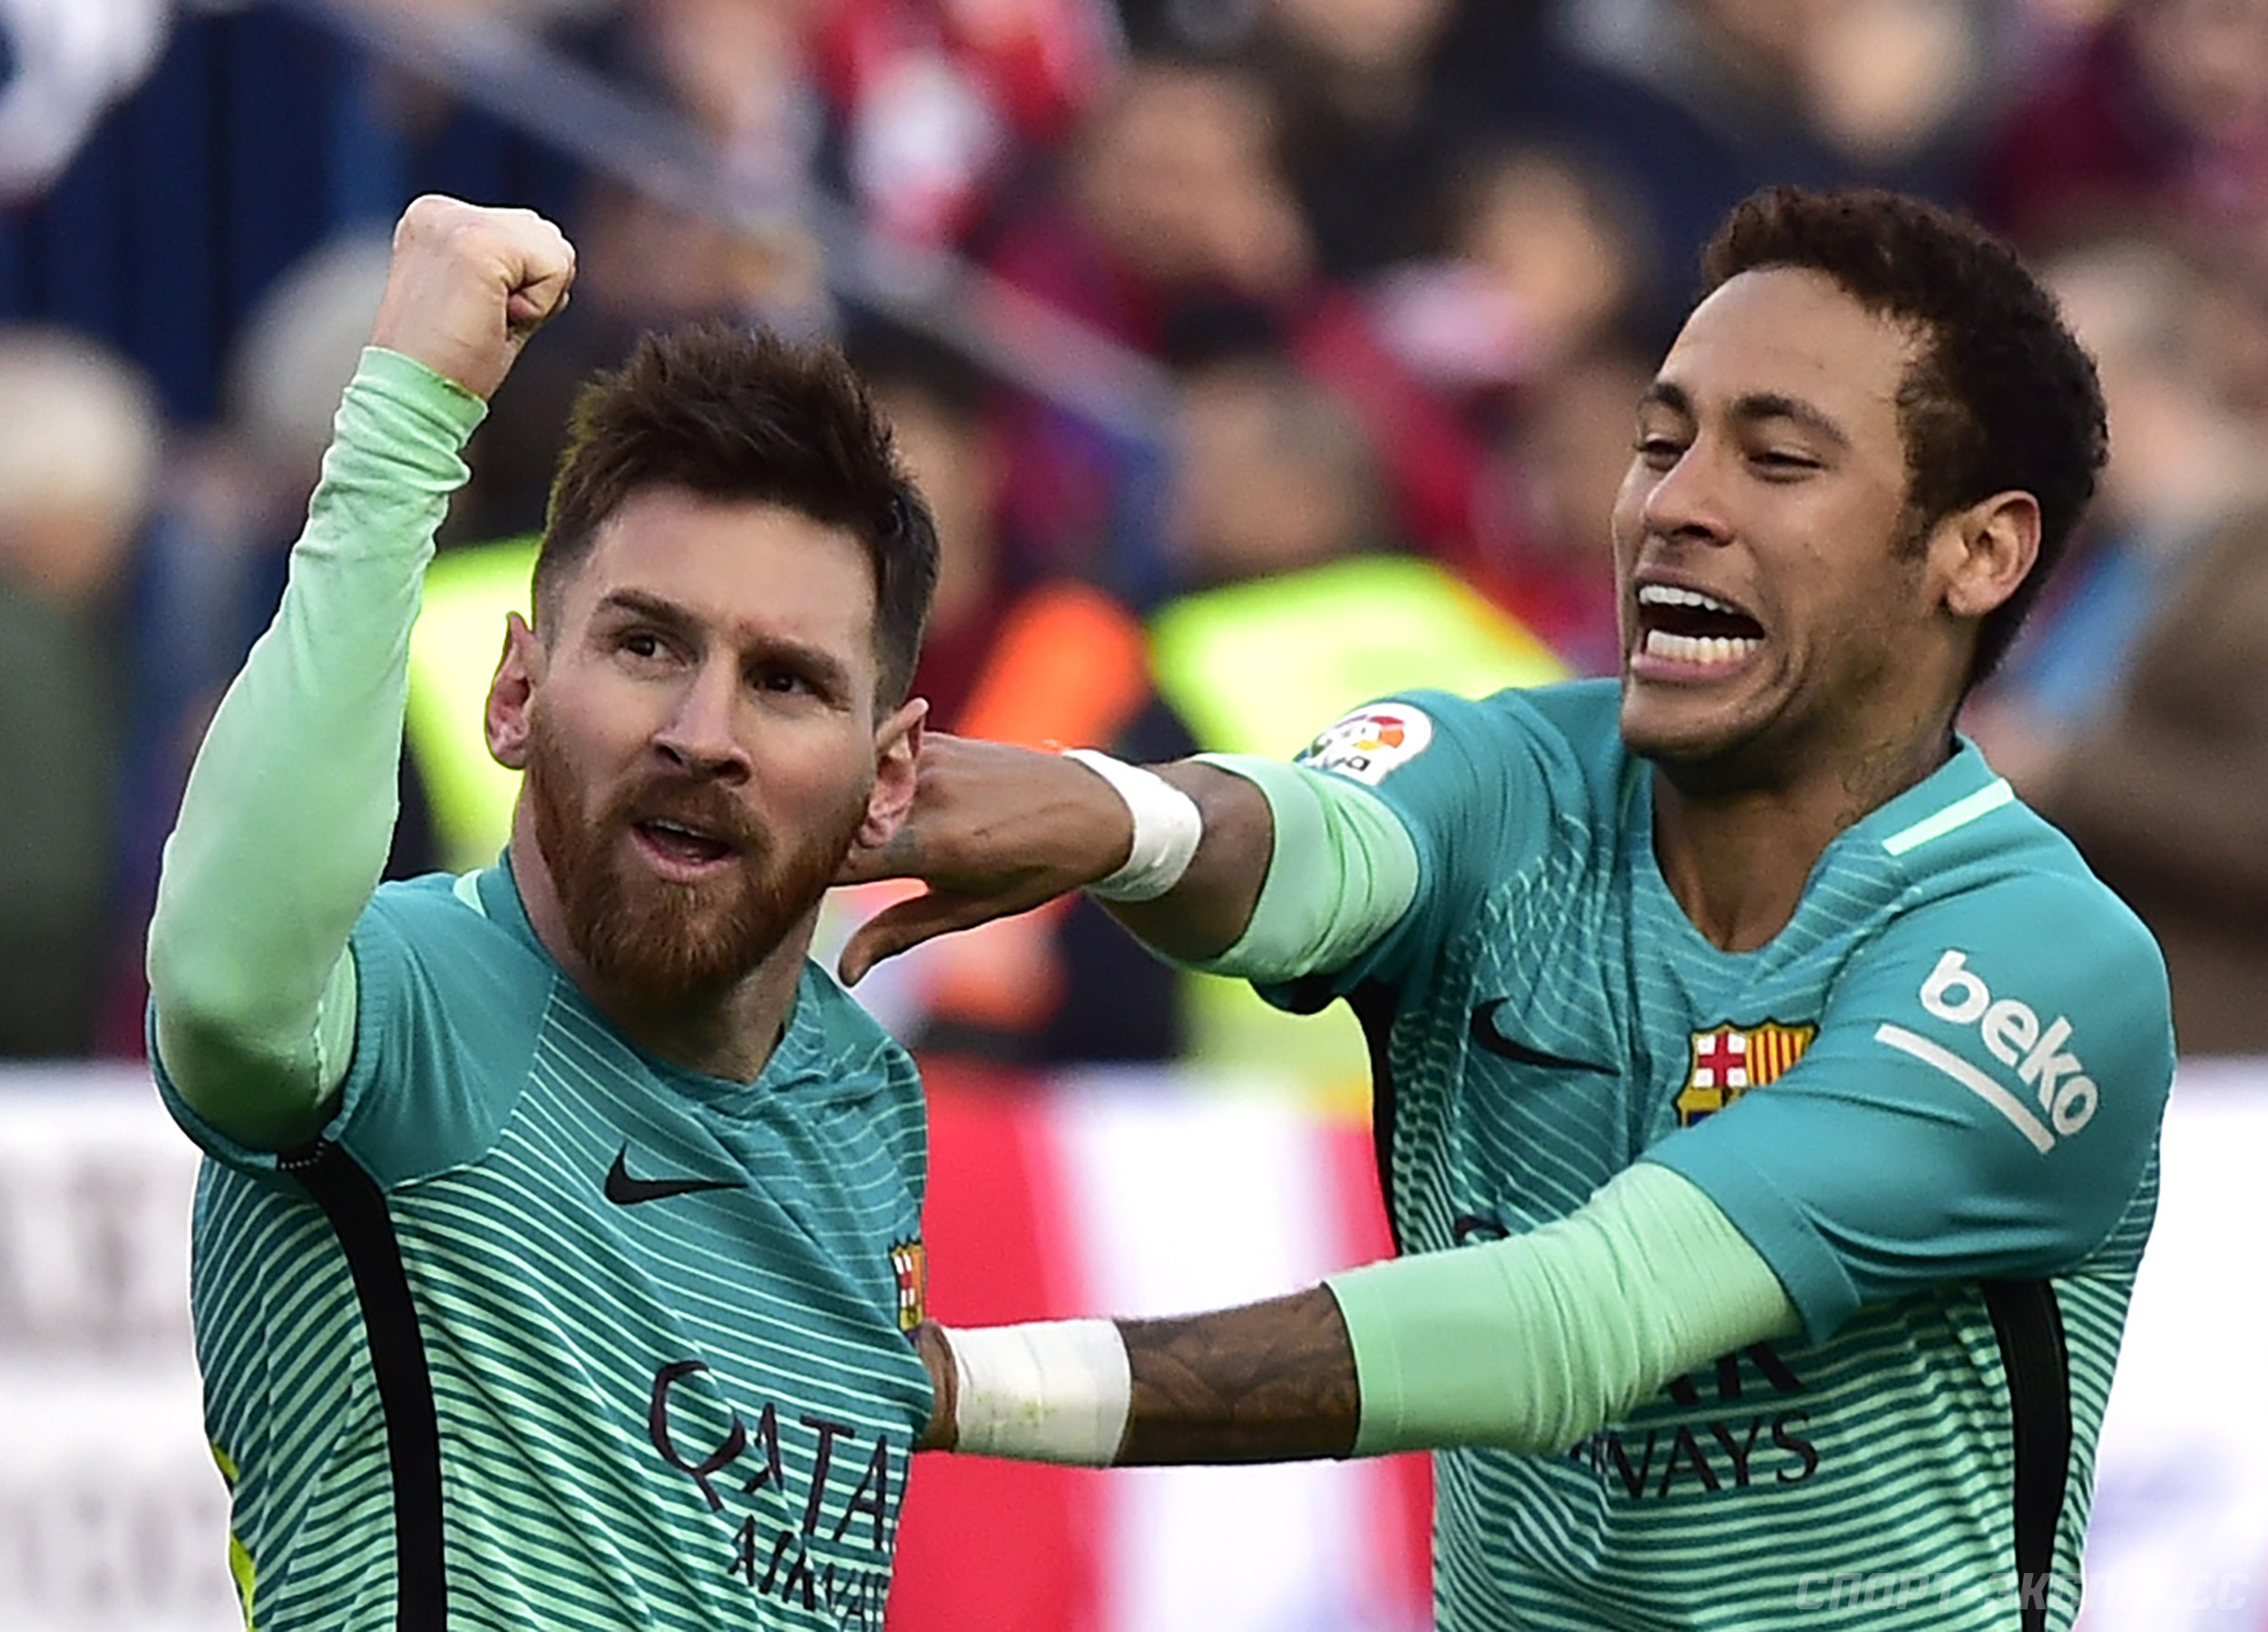 Прогноз на матч Барселона - Спортинг Хихон 01 марта 2017